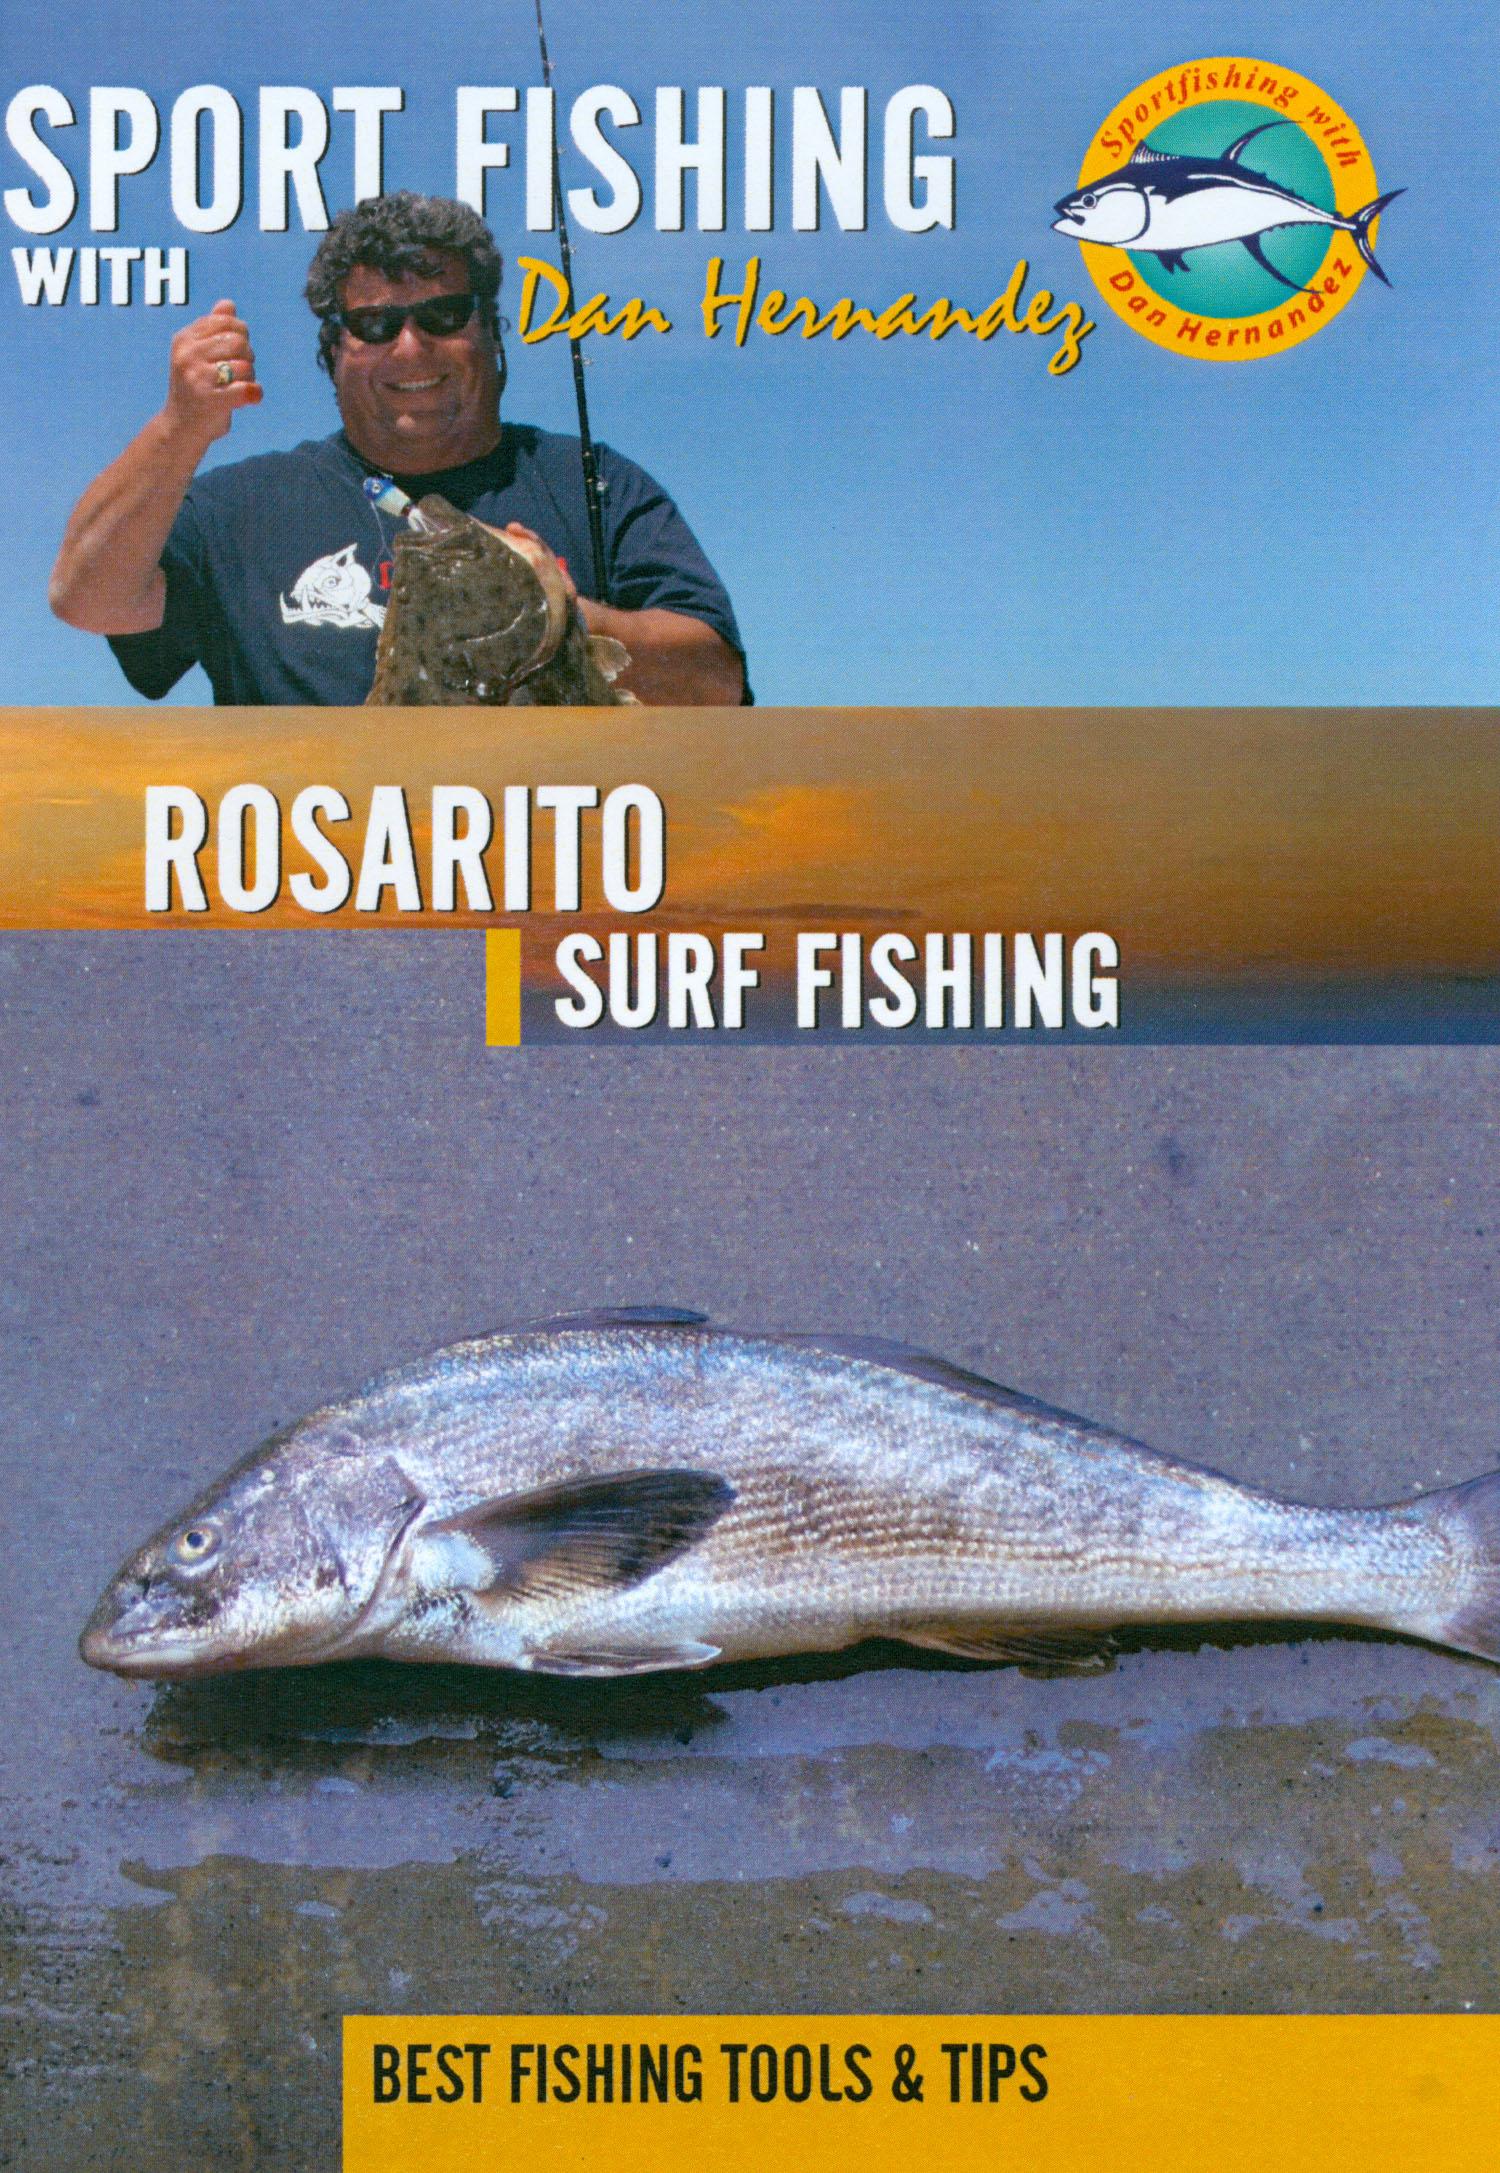 Sport Fishing With Dan Hernandez: Rosarito Surf Fishing